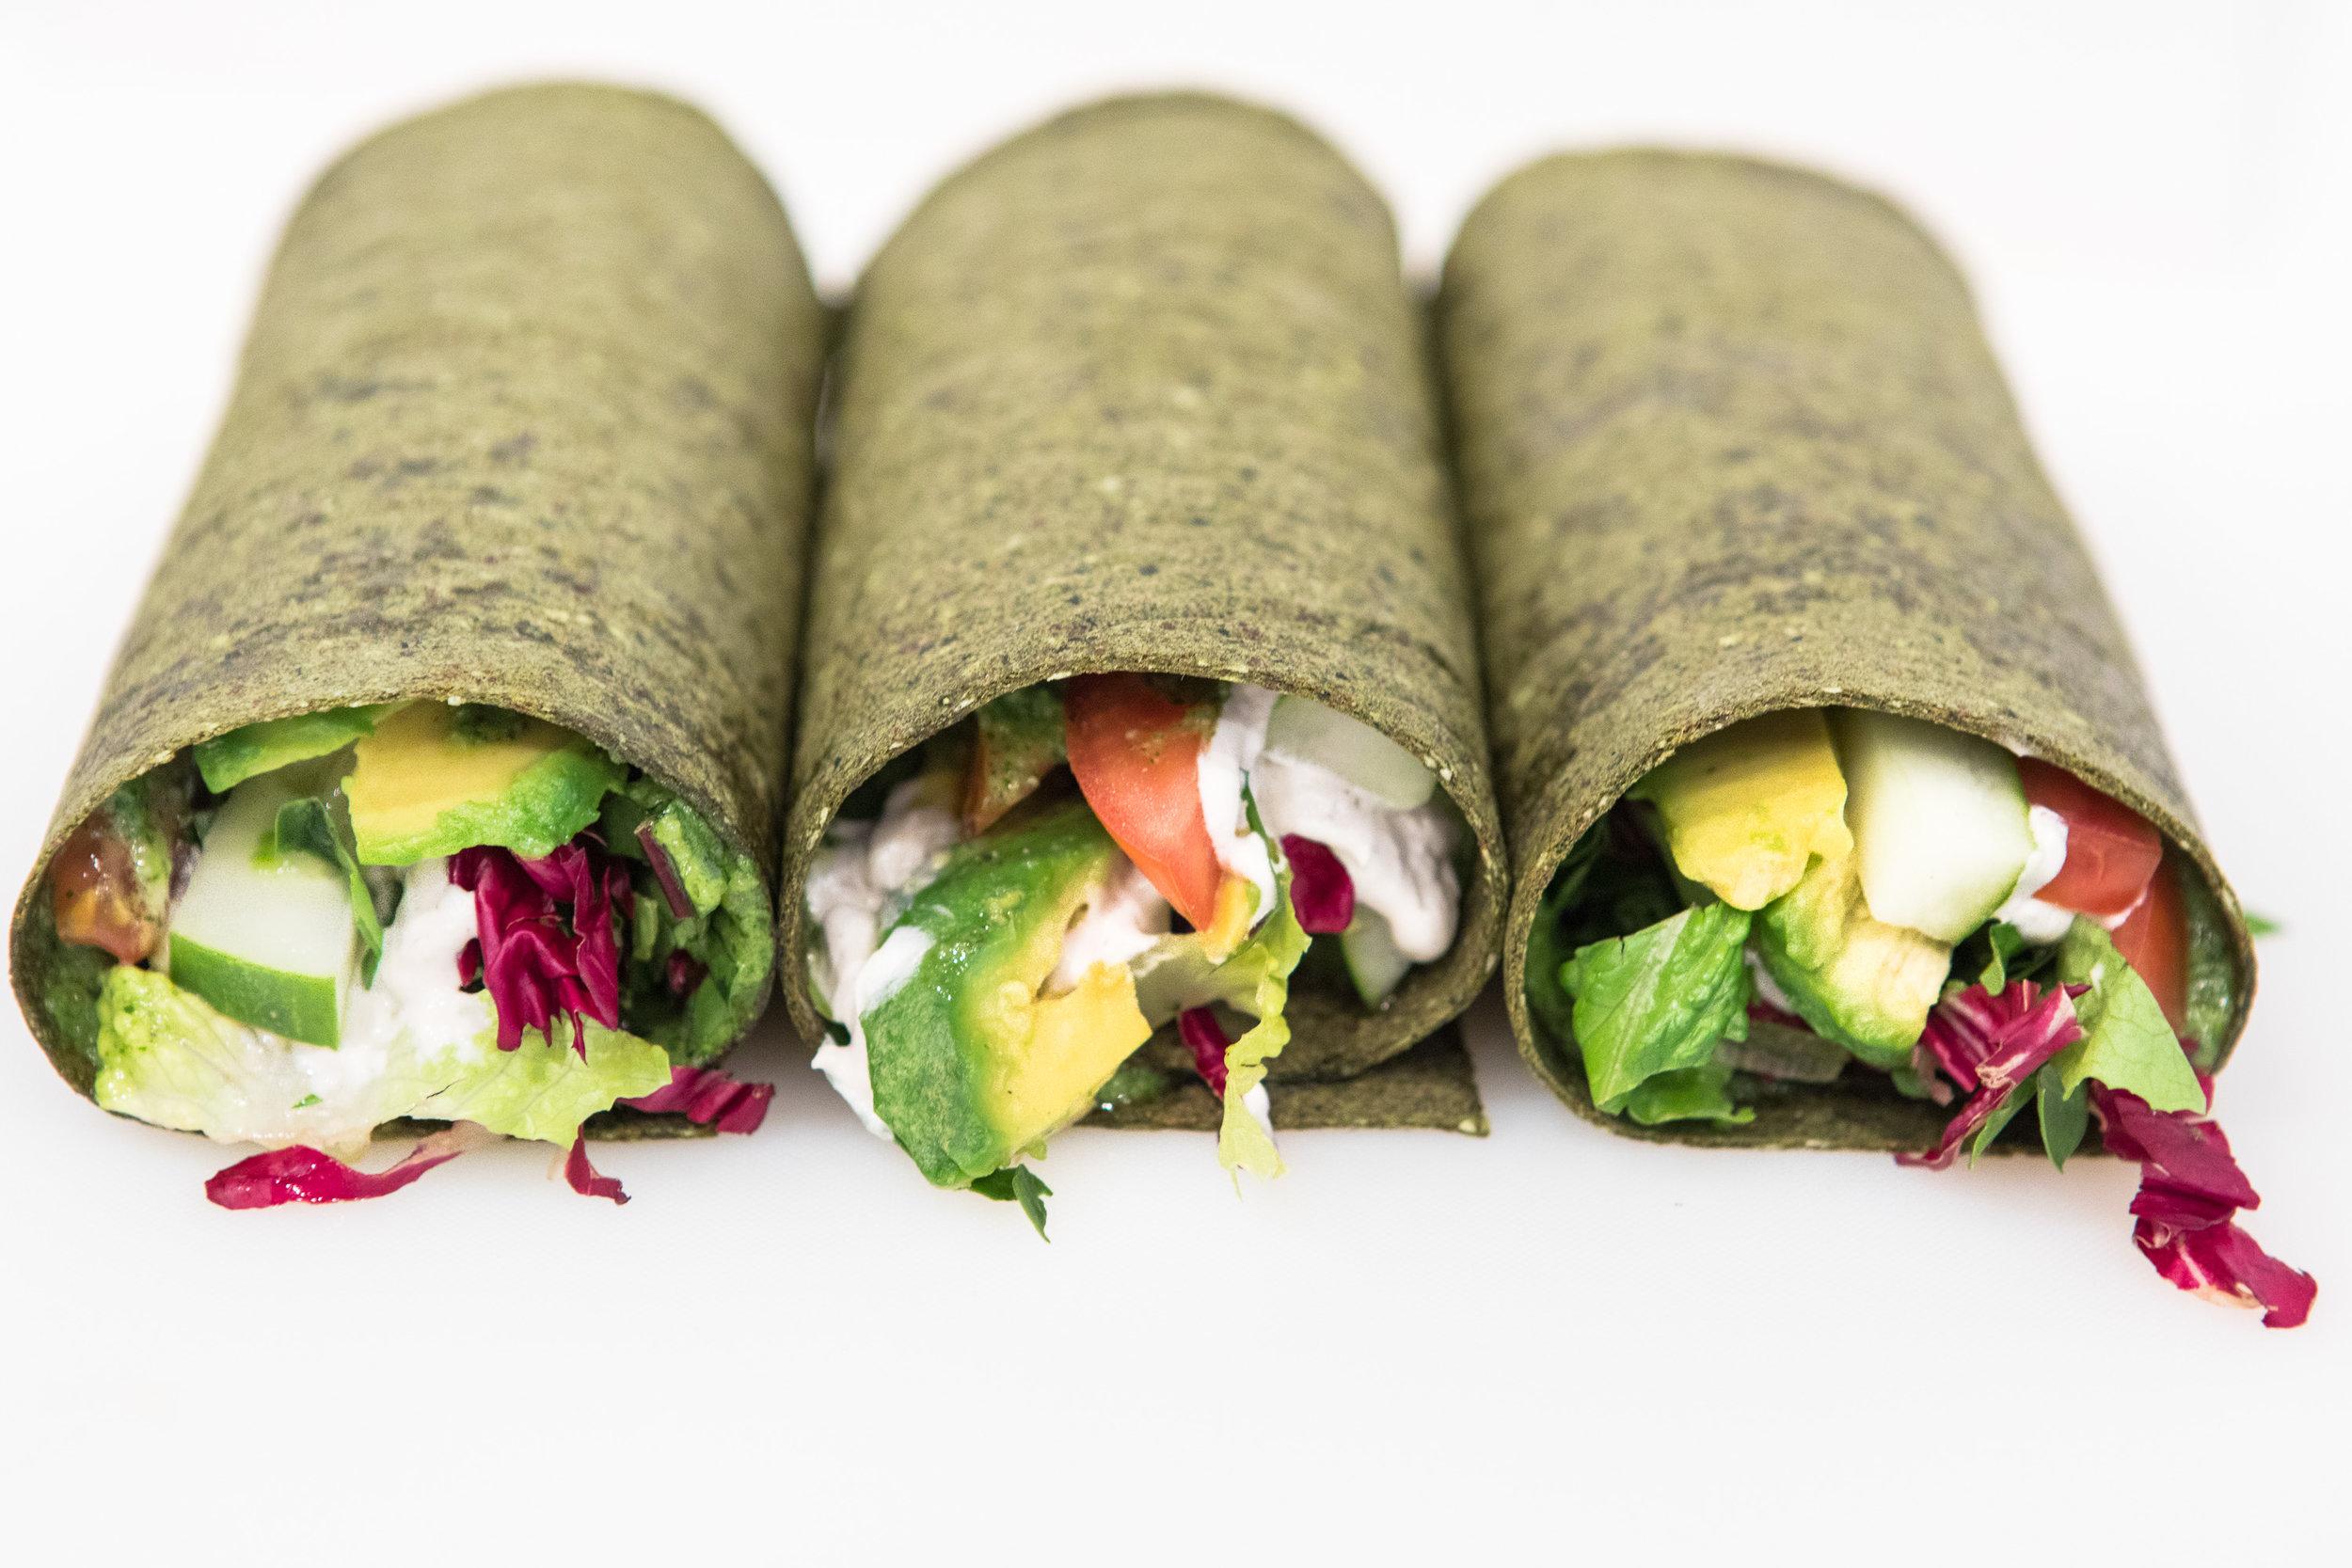 gluten-free-vegan-wraps-maka-cafe-maui-1.jpg